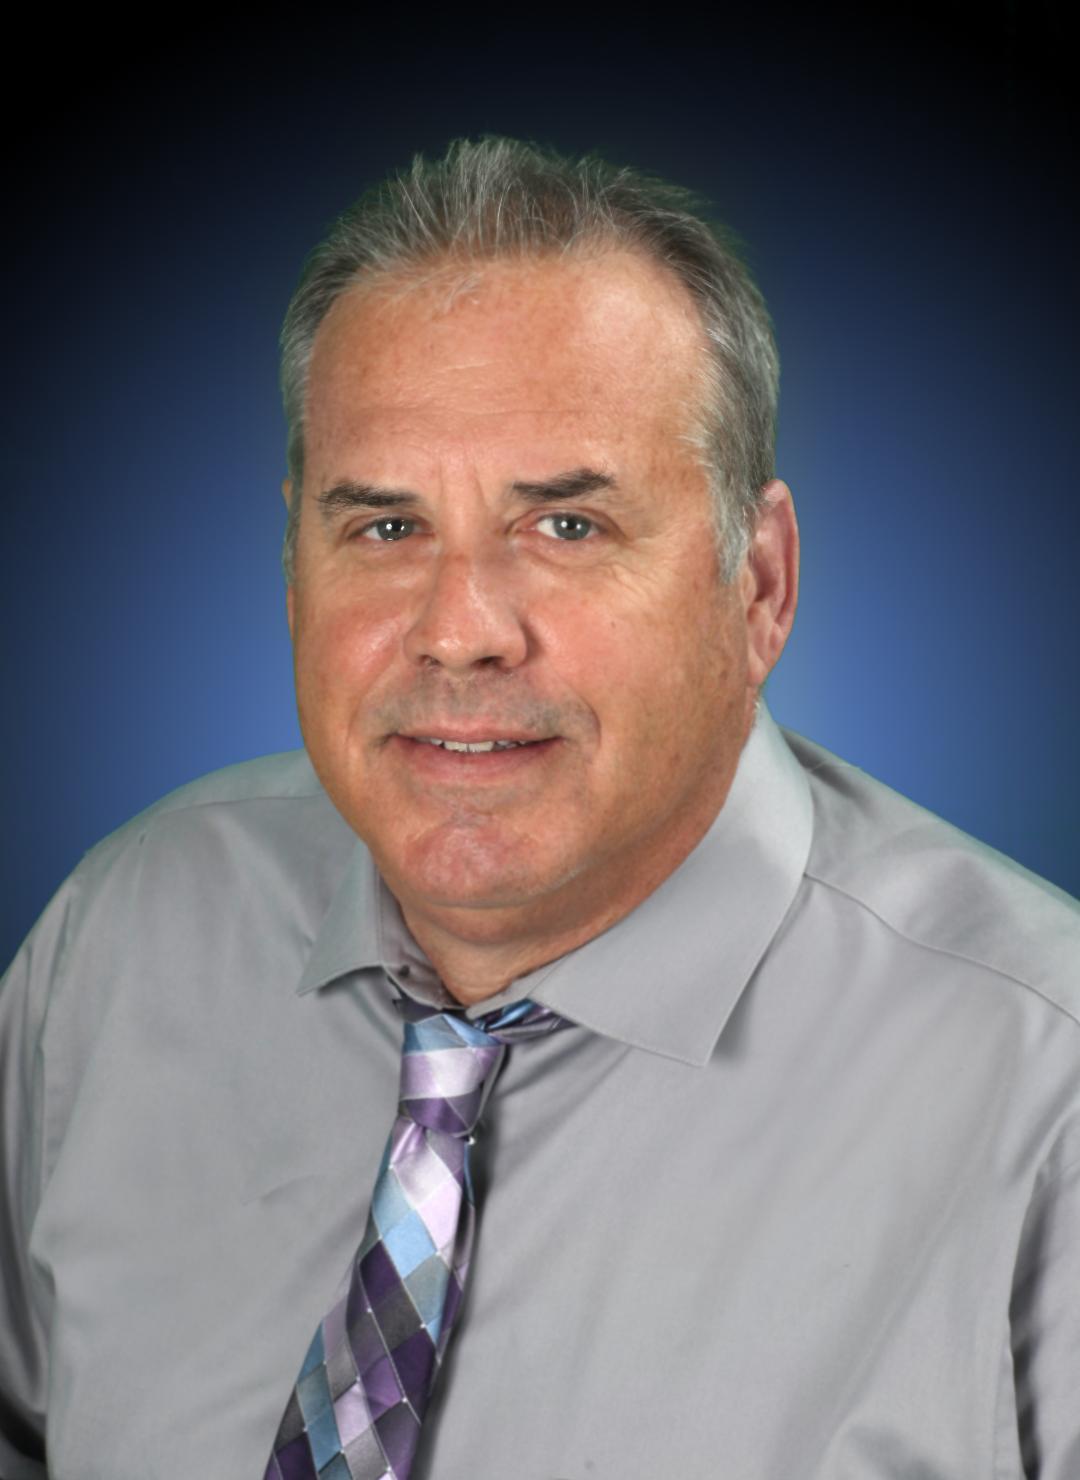 Paul W. Hayhurst